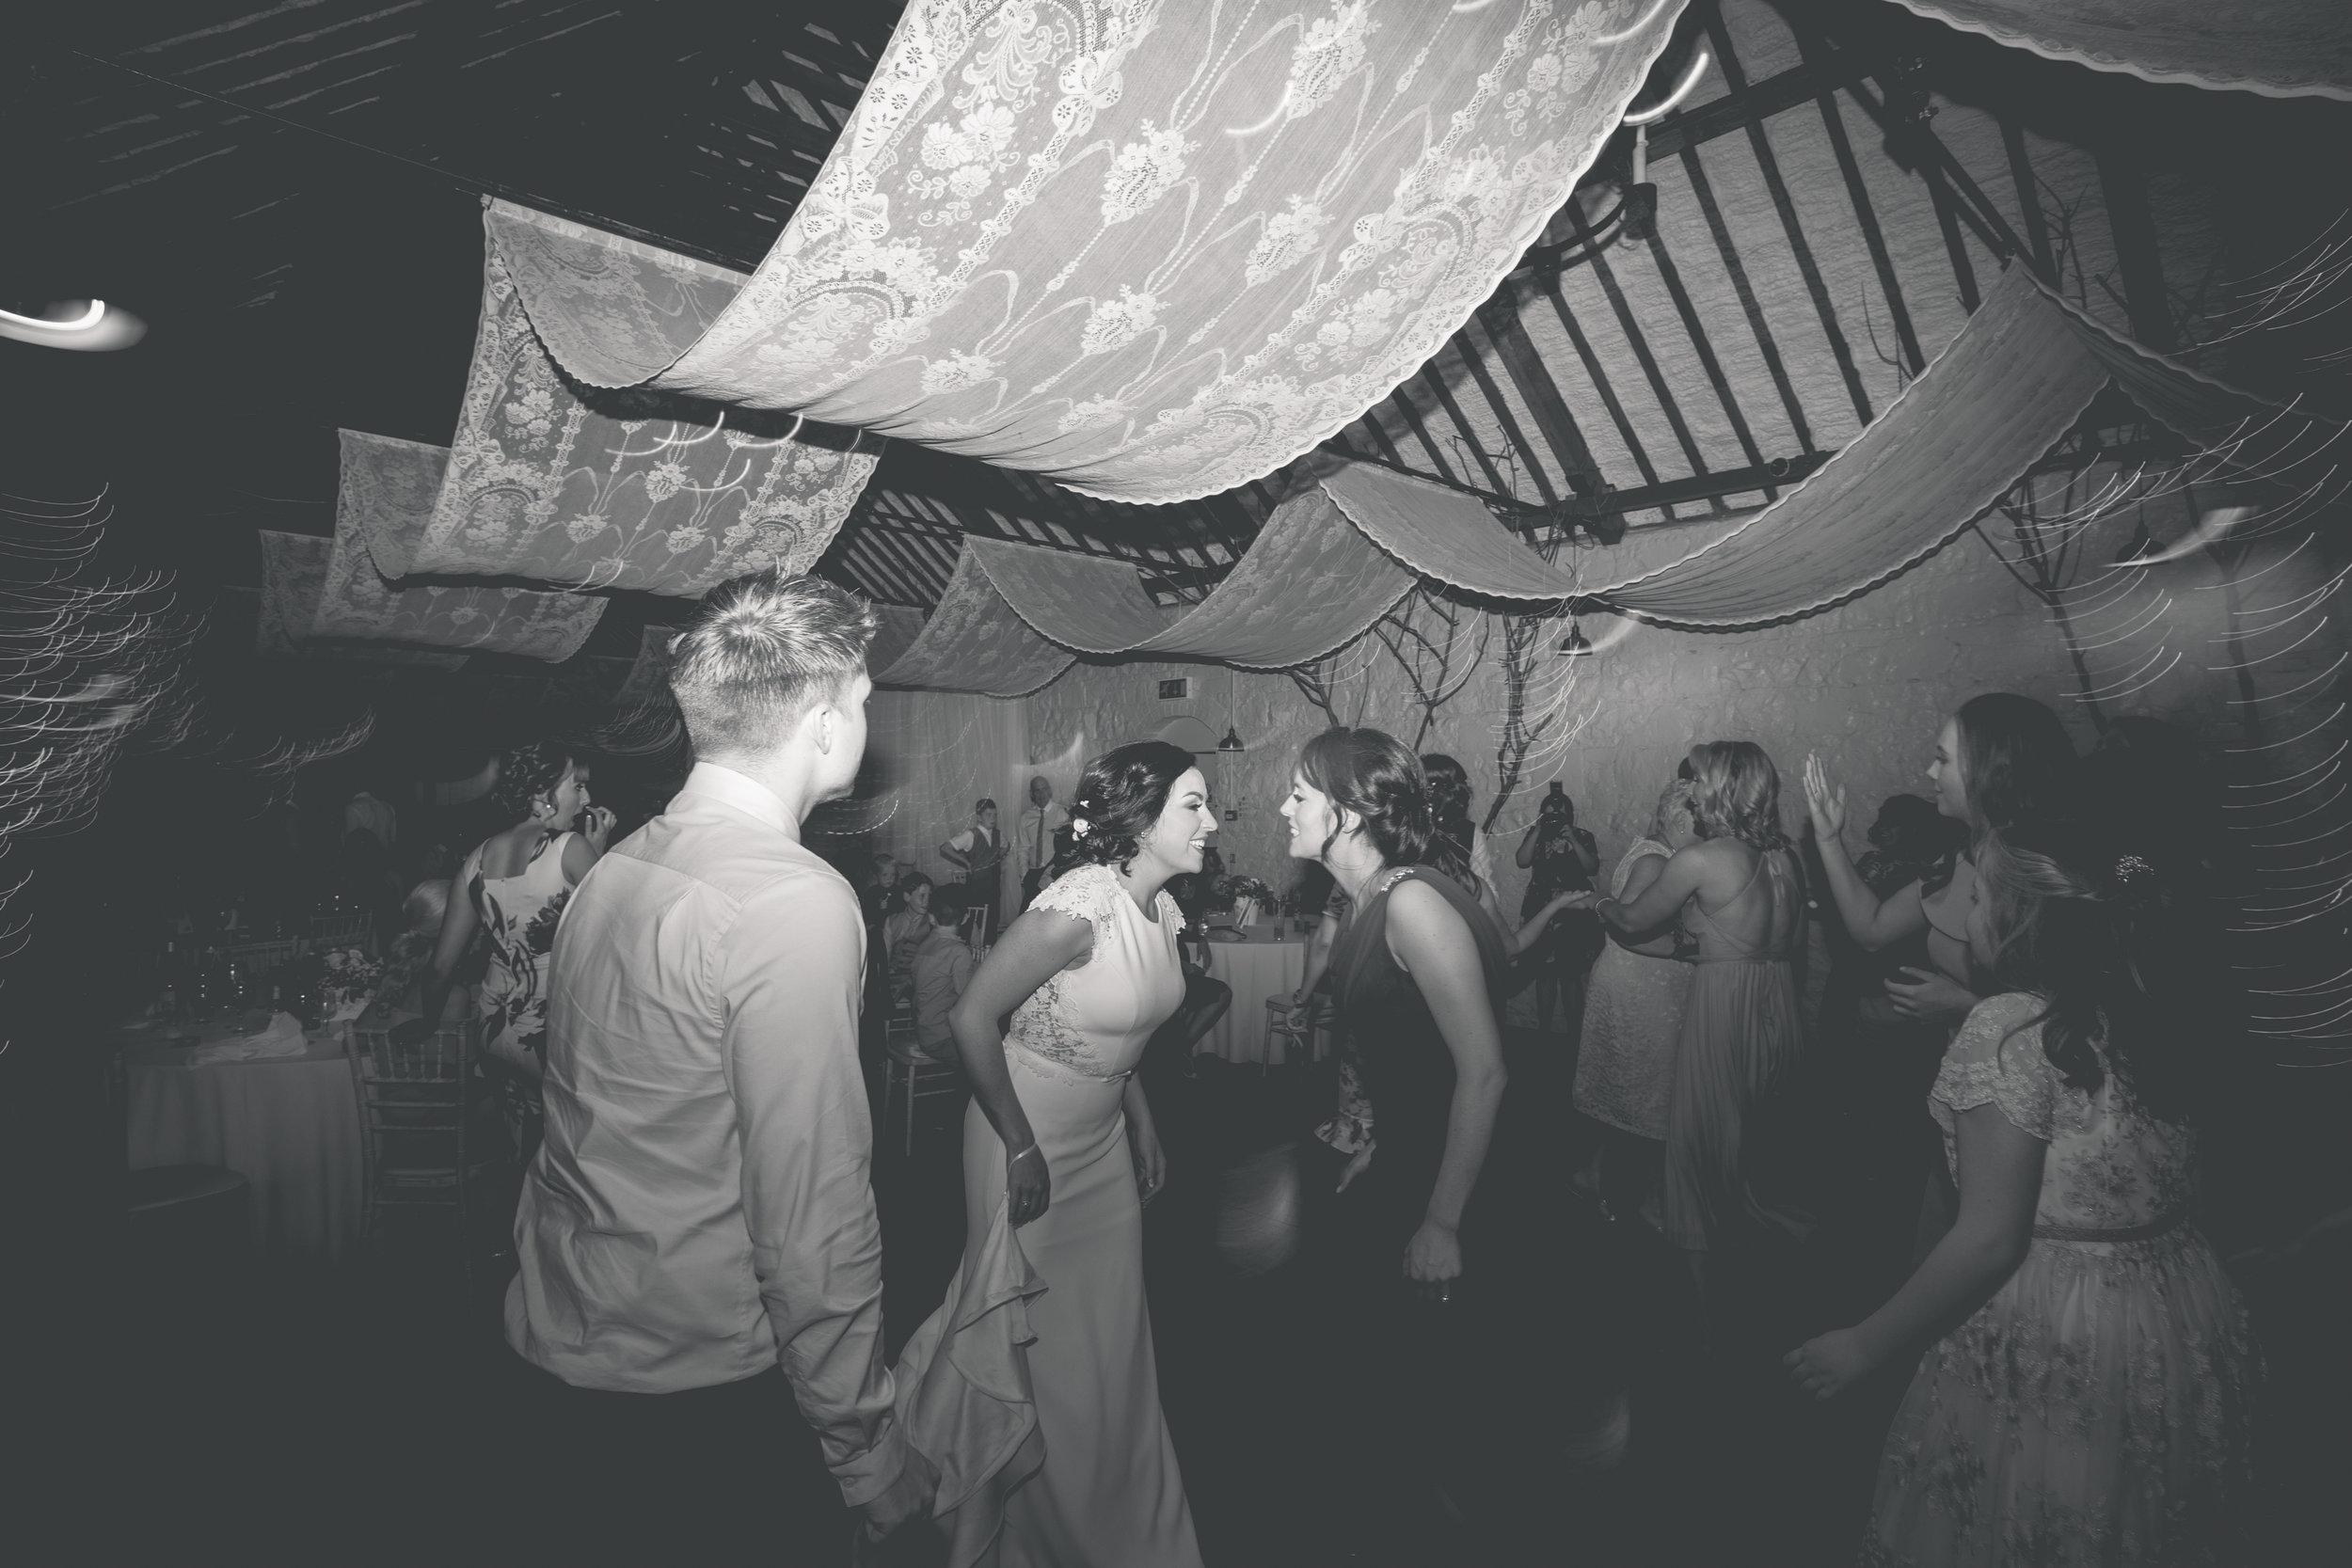 Brian McEwan Wedding Photography | Carol-Annee & Sean | The Dancing-84.jpg